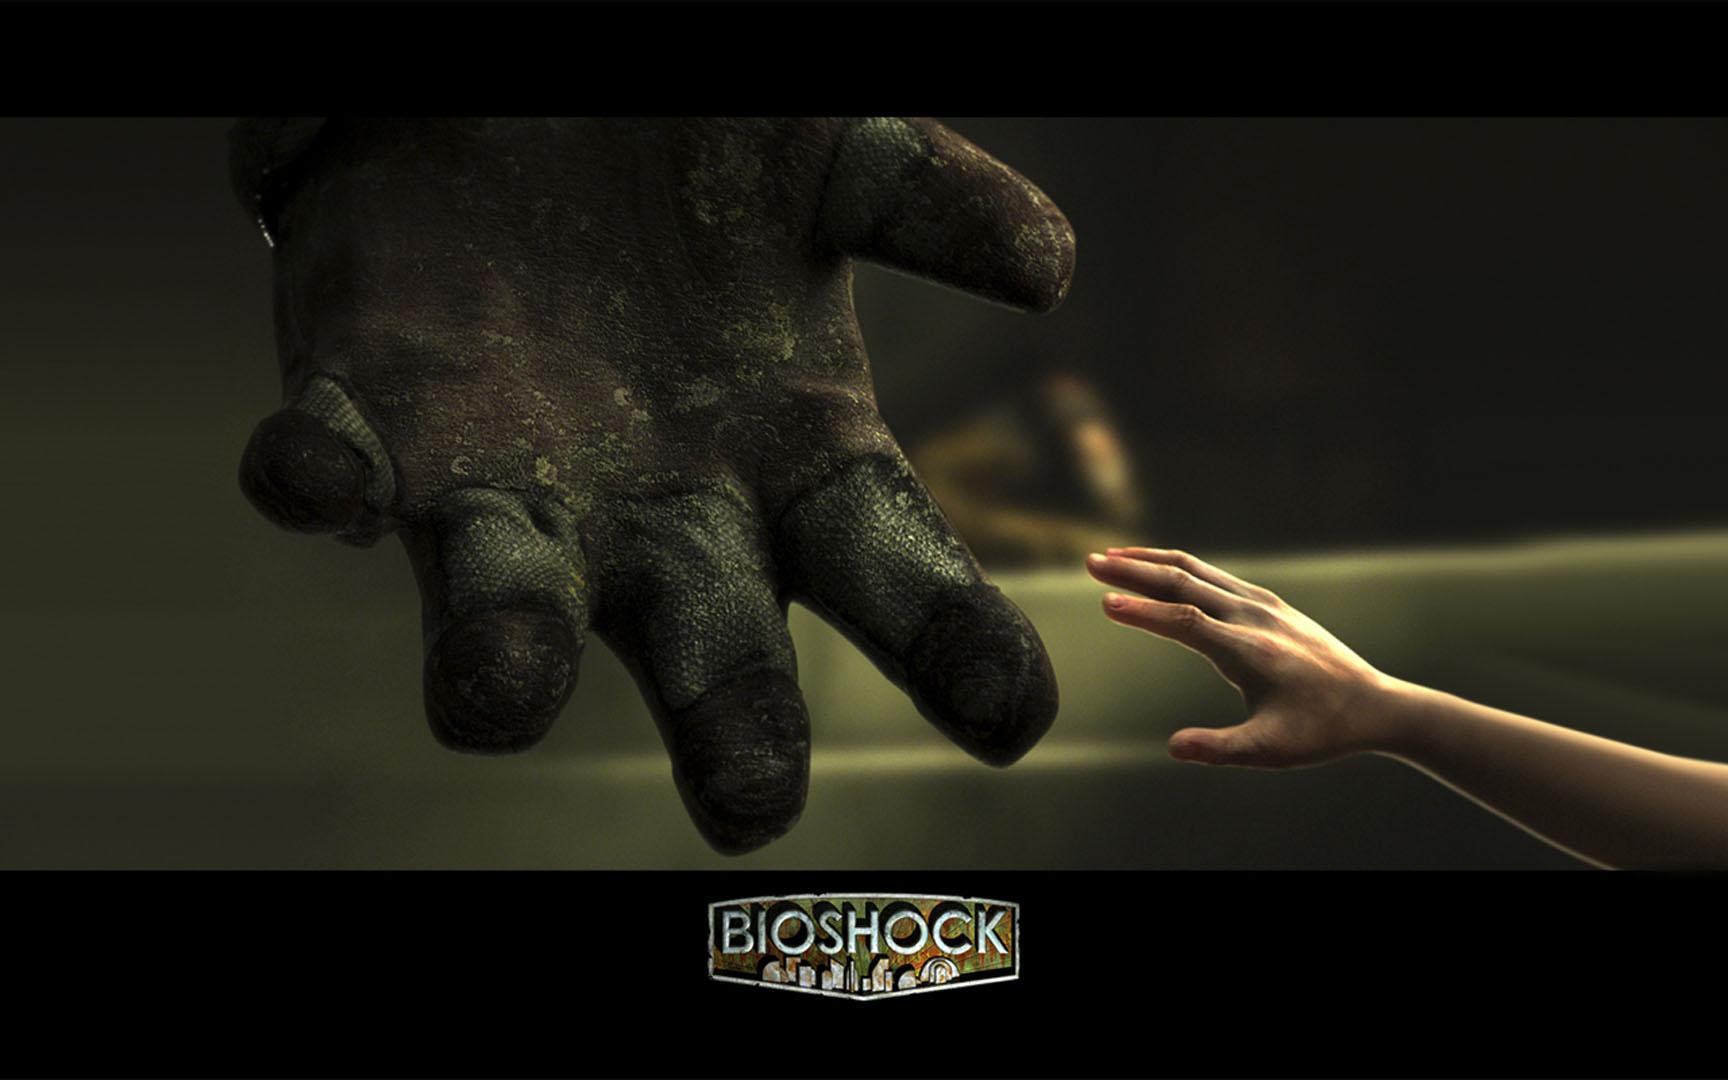 Bioshock Hand